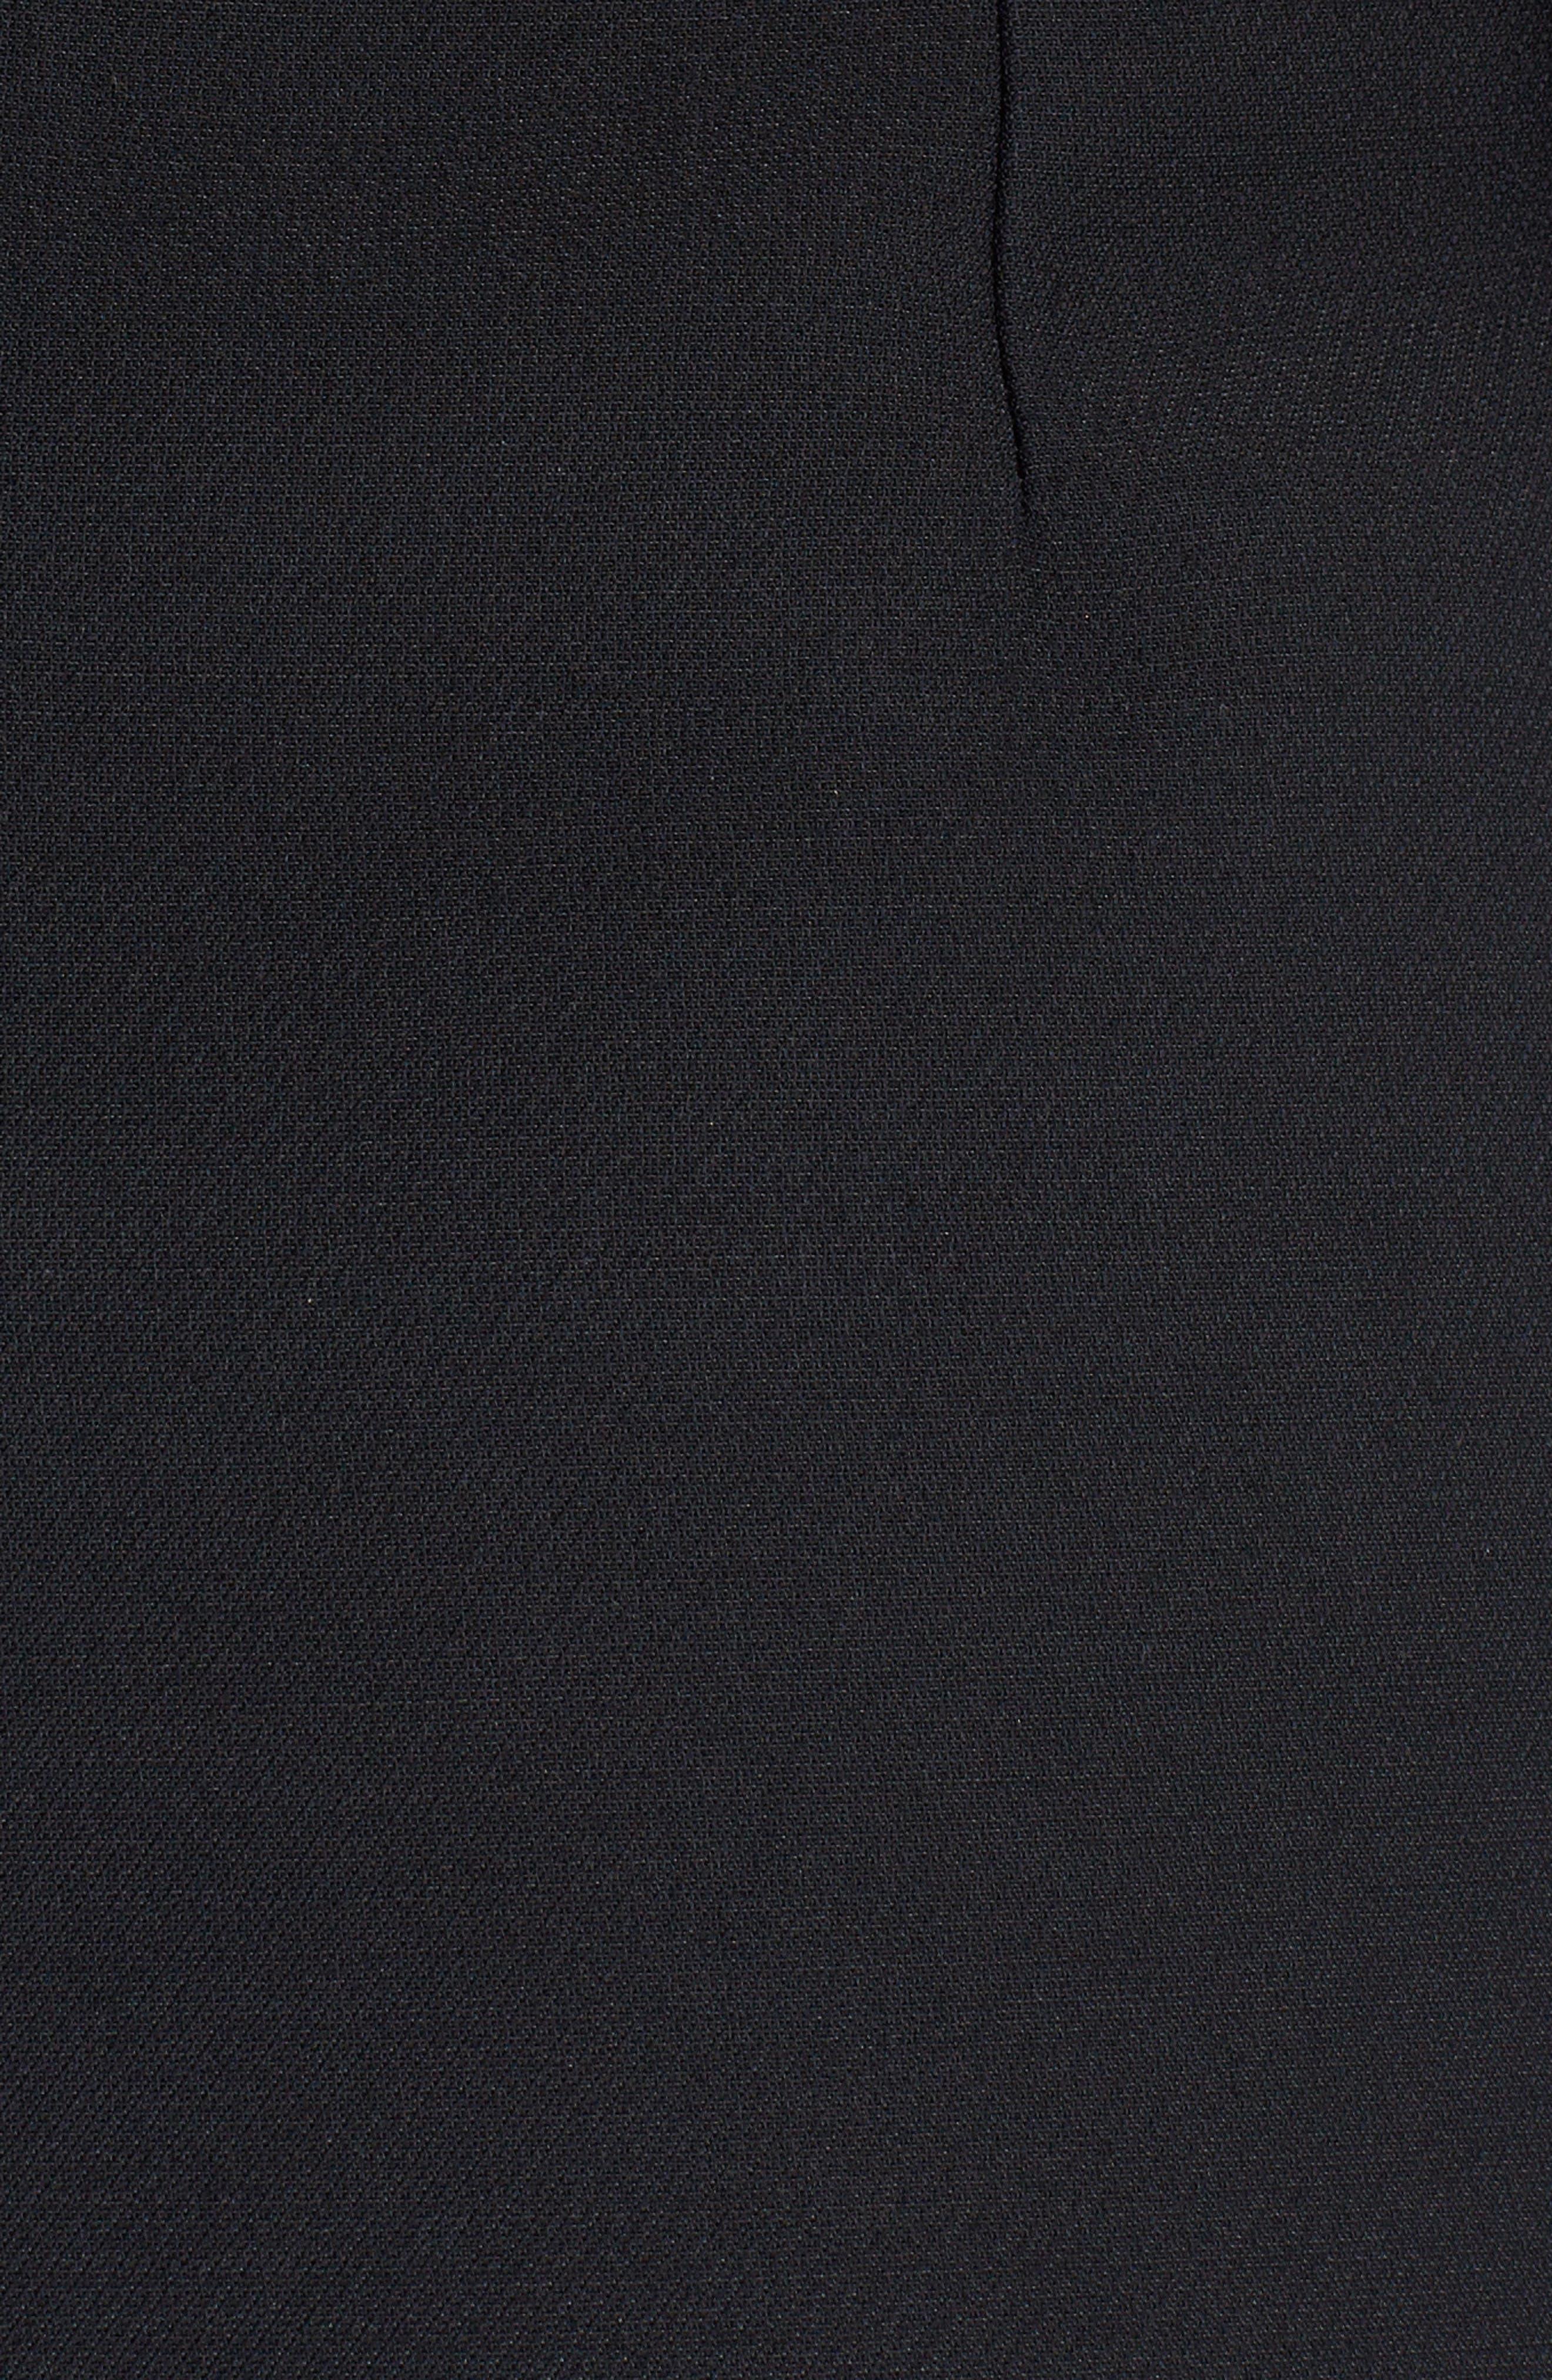 Embellished Wool & Silk Gazar Dress,                             Alternate thumbnail 5, color,                             001